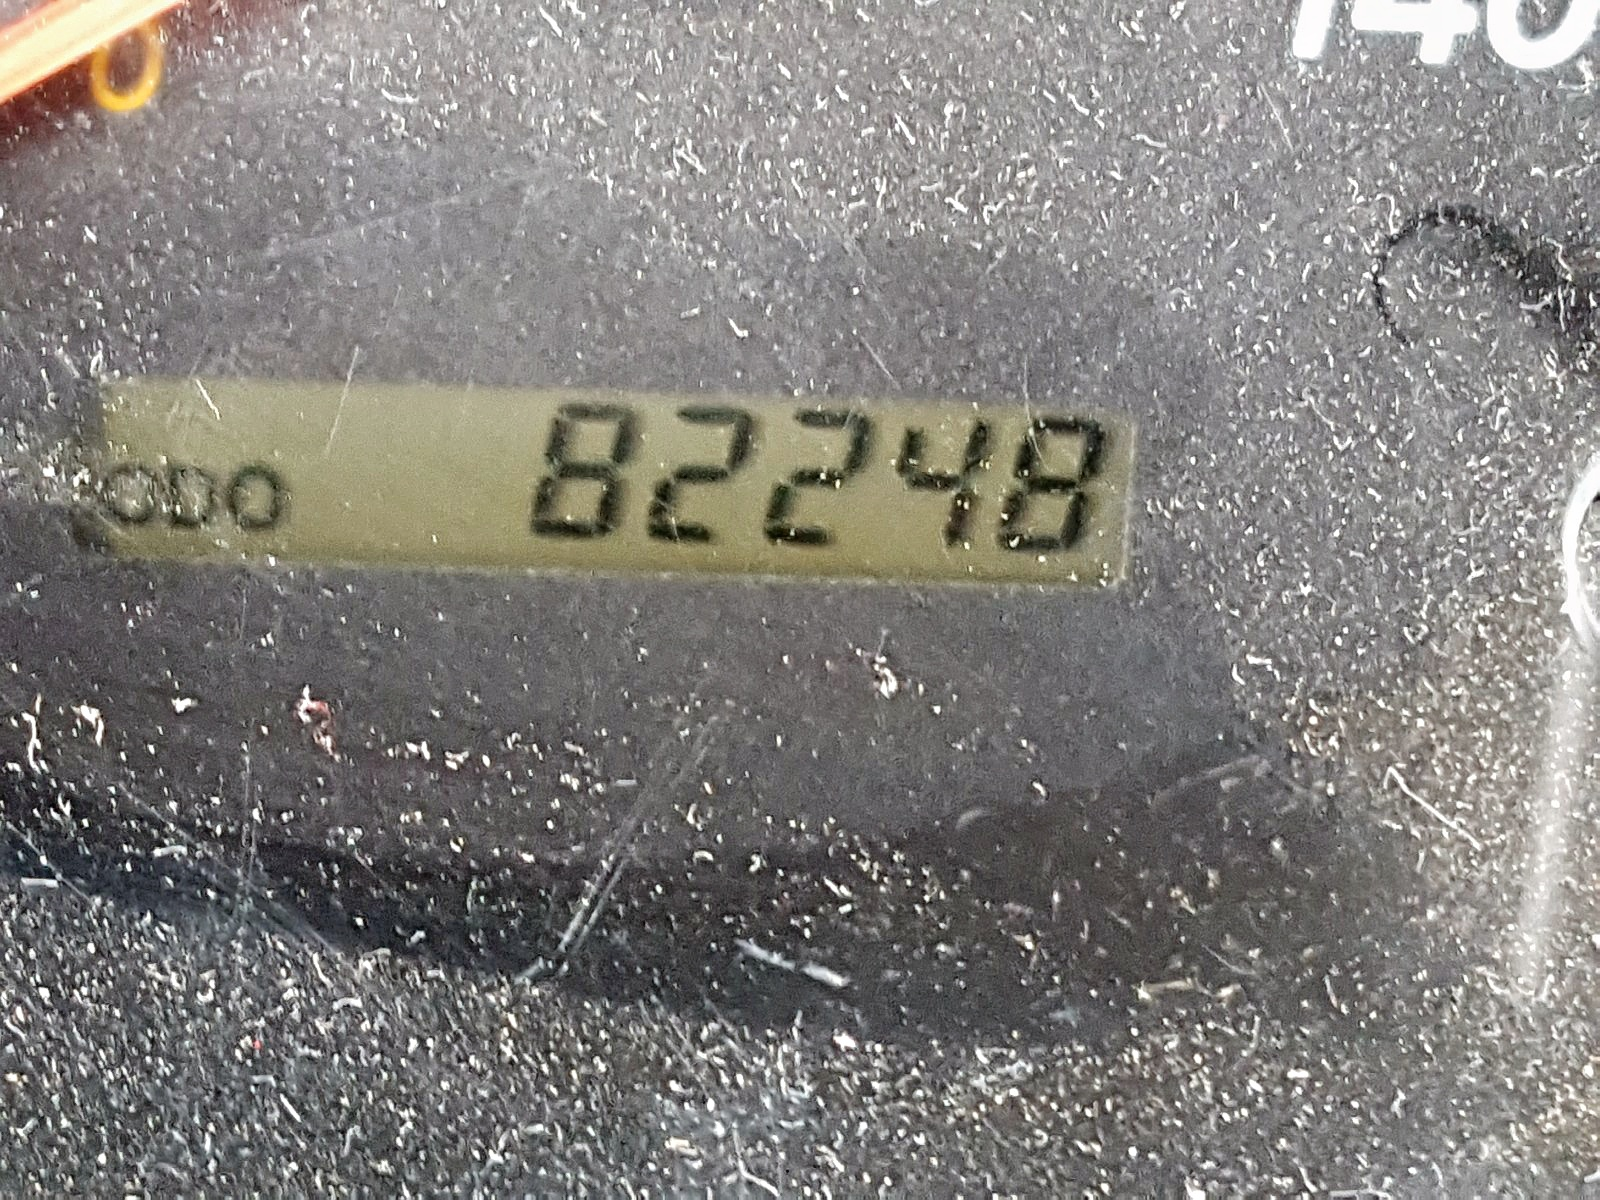 JTEGF21A420043626 - 2002 Toyota Highlander 3.0L front view